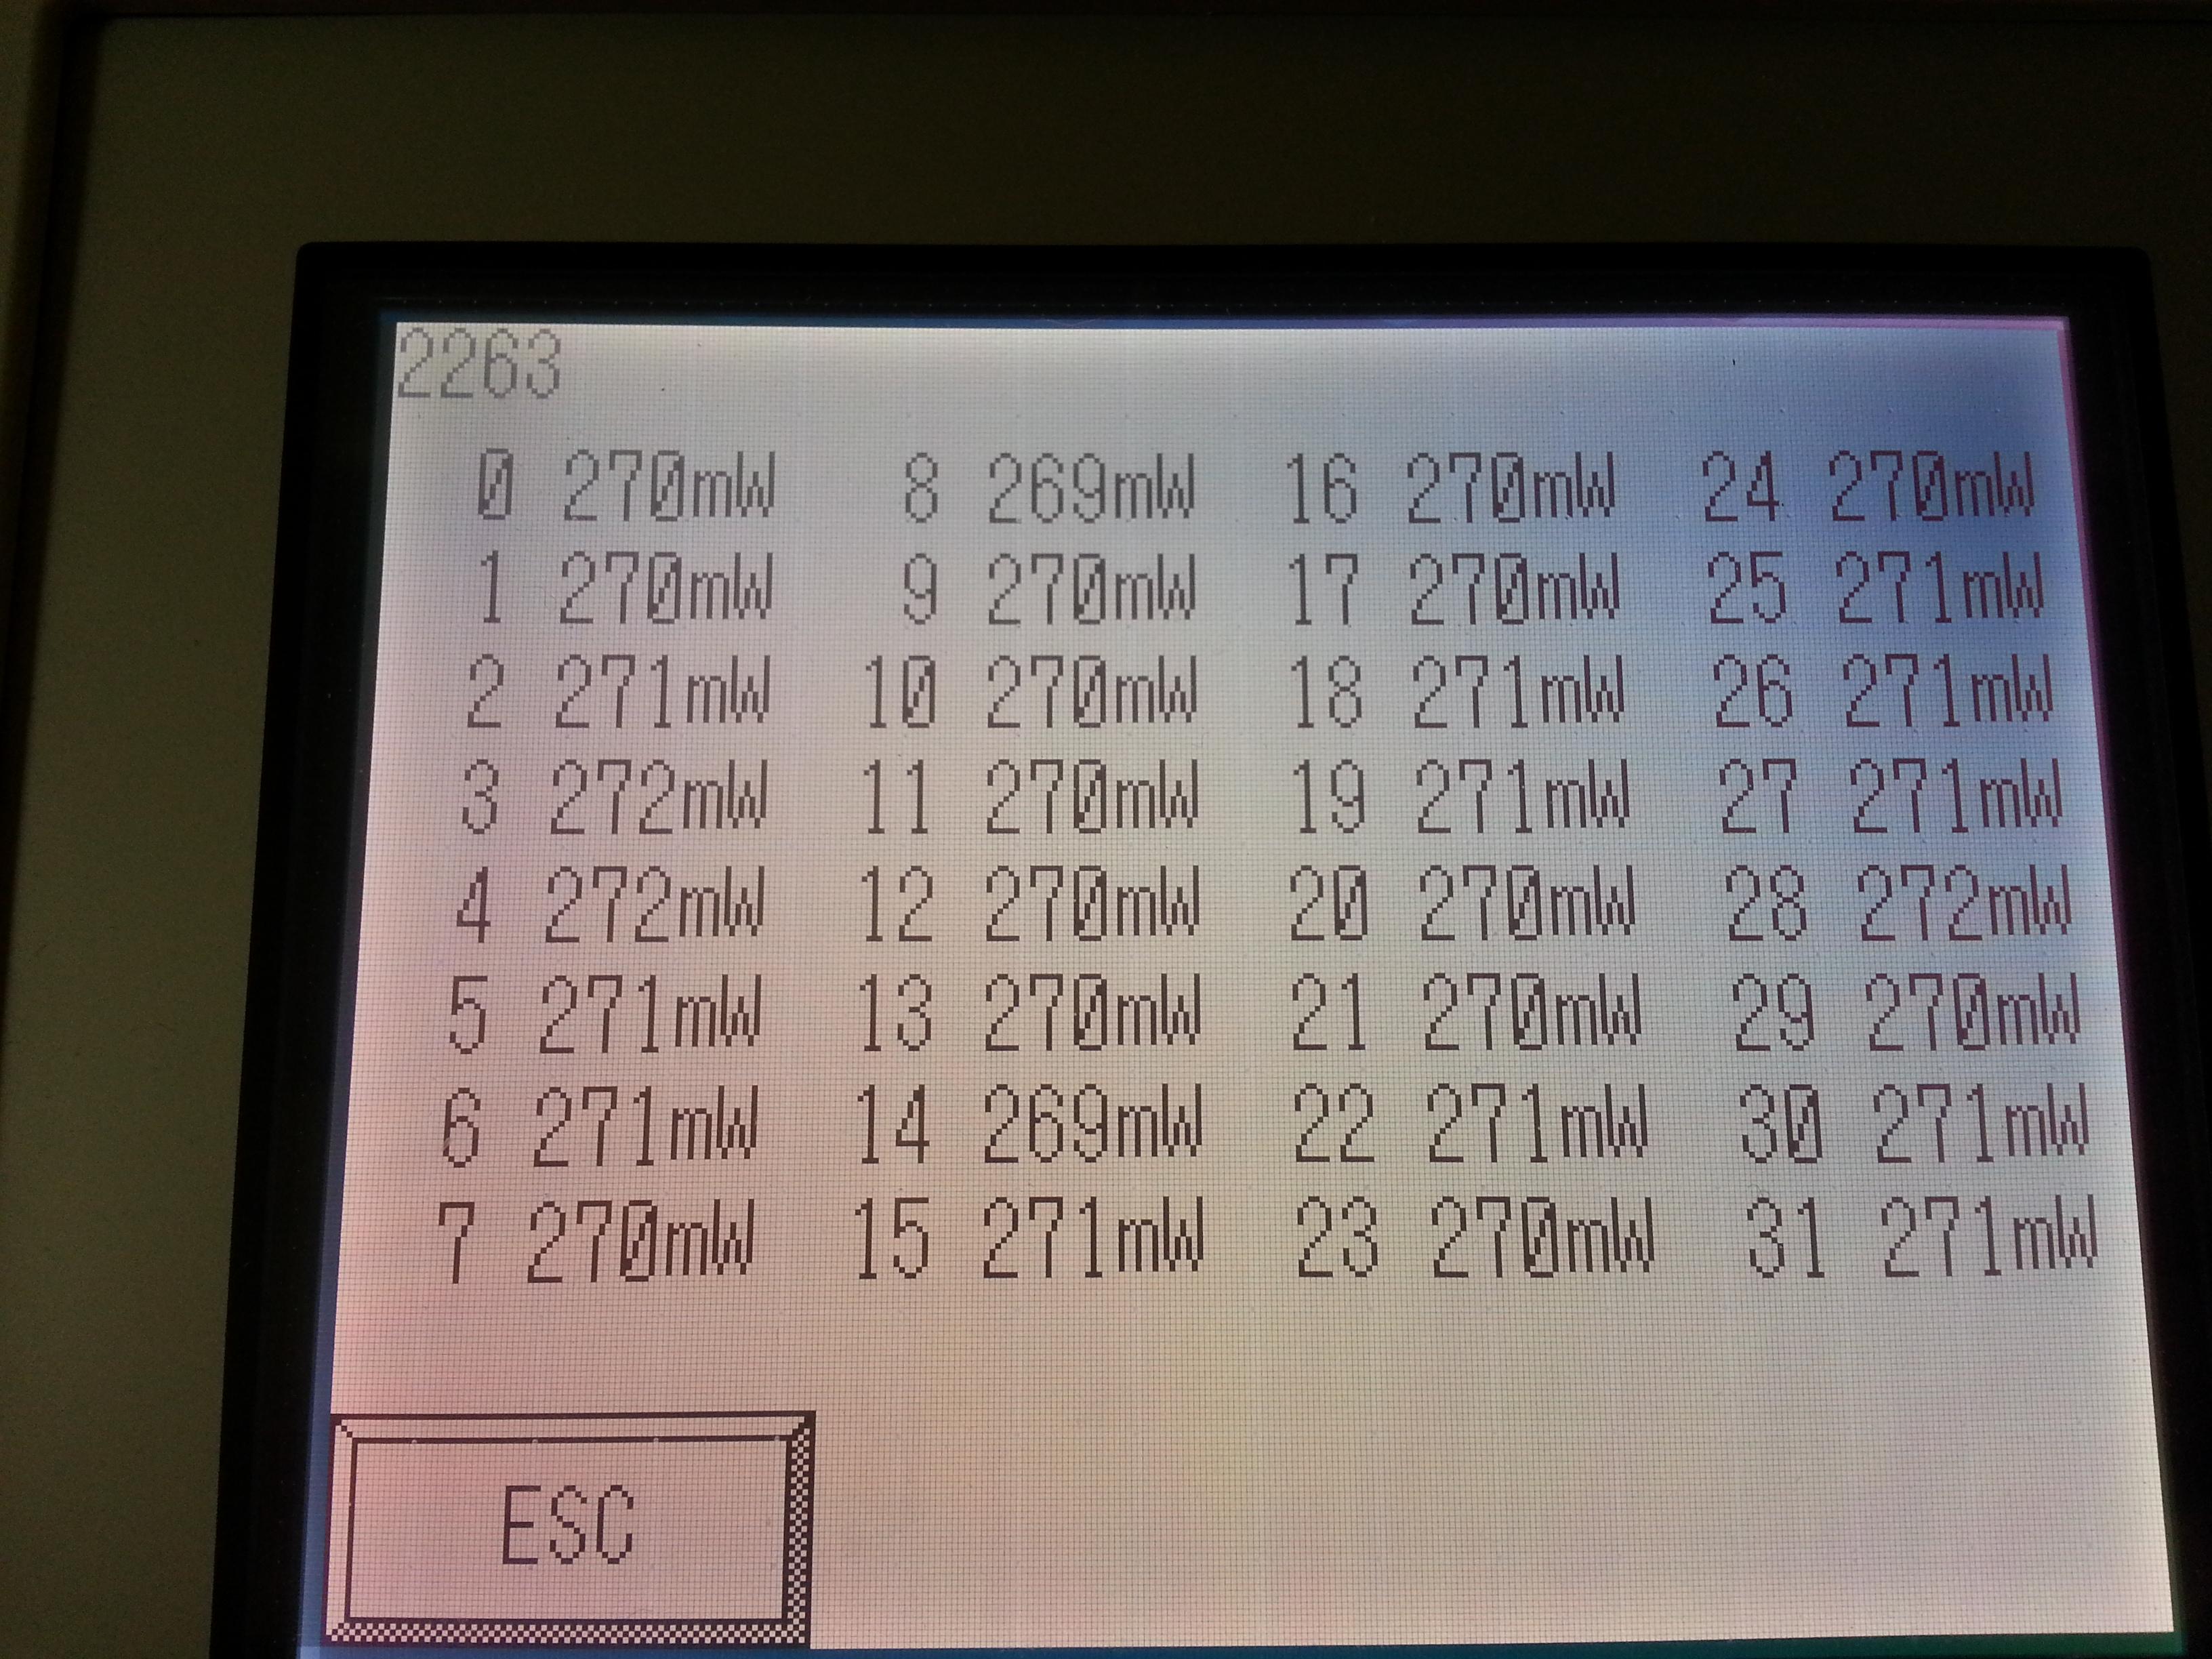 SCREEN PTR 8300 NS CTP